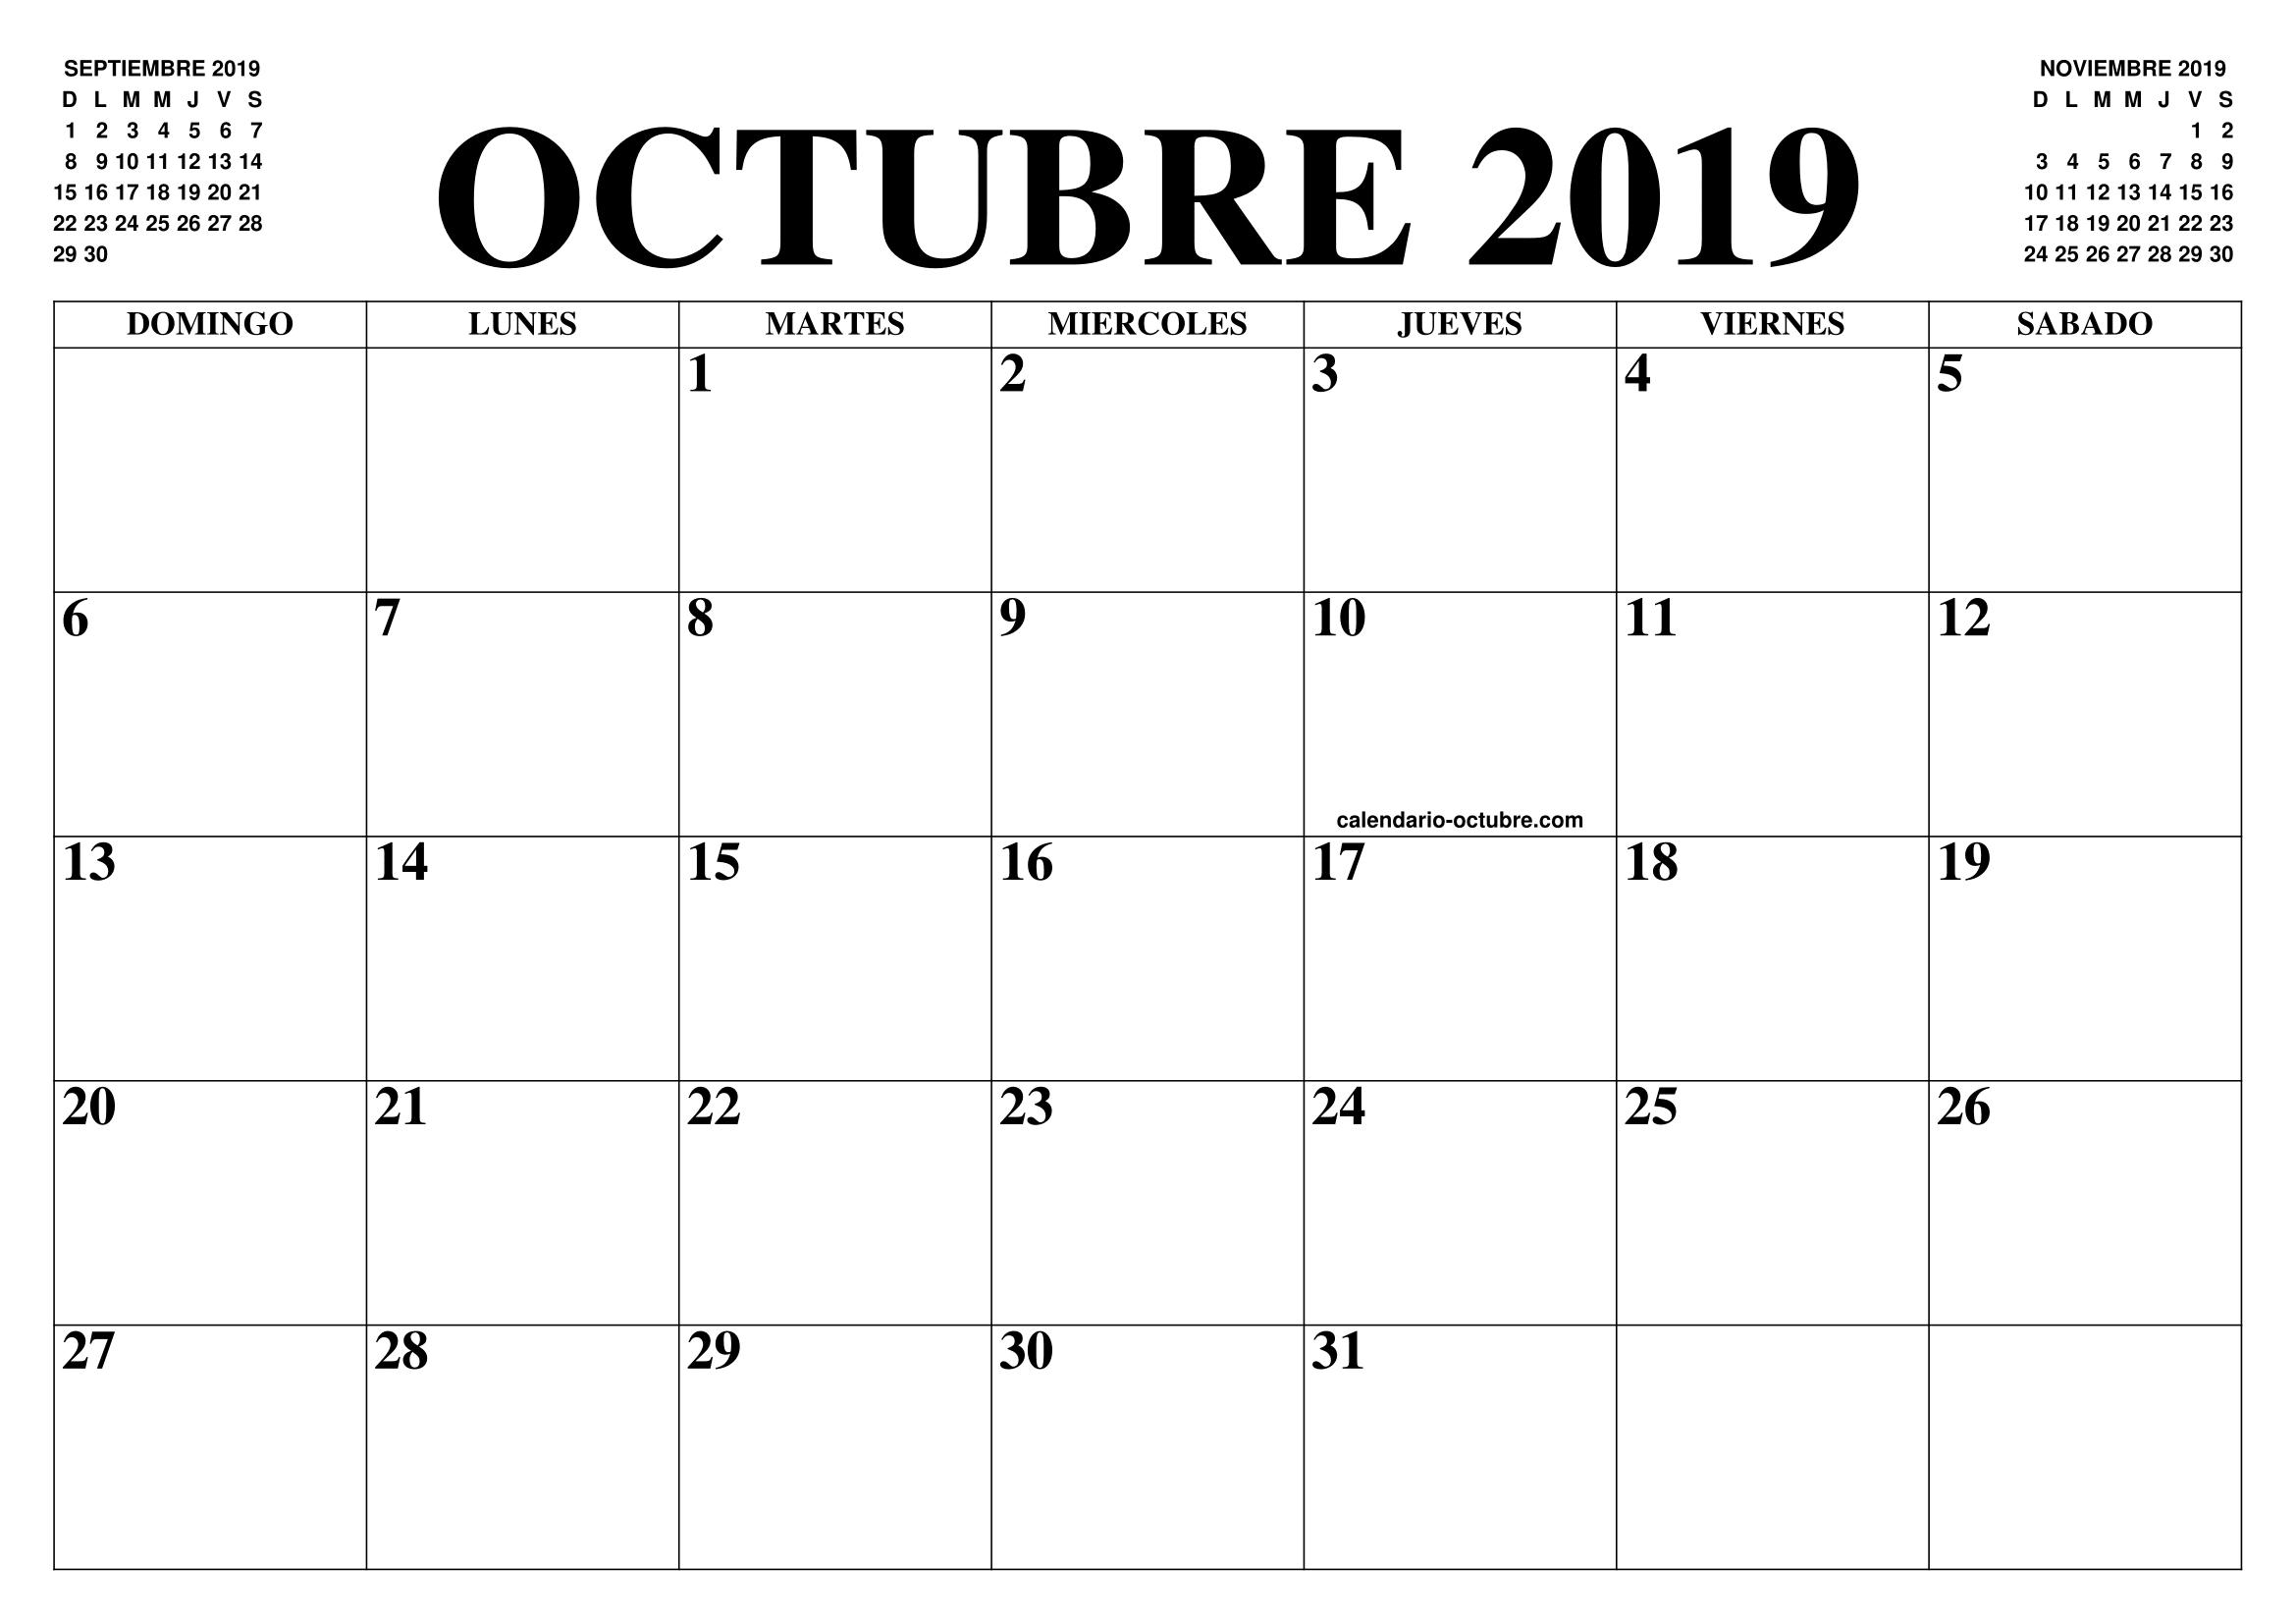 Calendario Mes De Octubre 2020 Para Imprimir.Calendario Octubre 2019 2020 El Calendario Octubre 2019